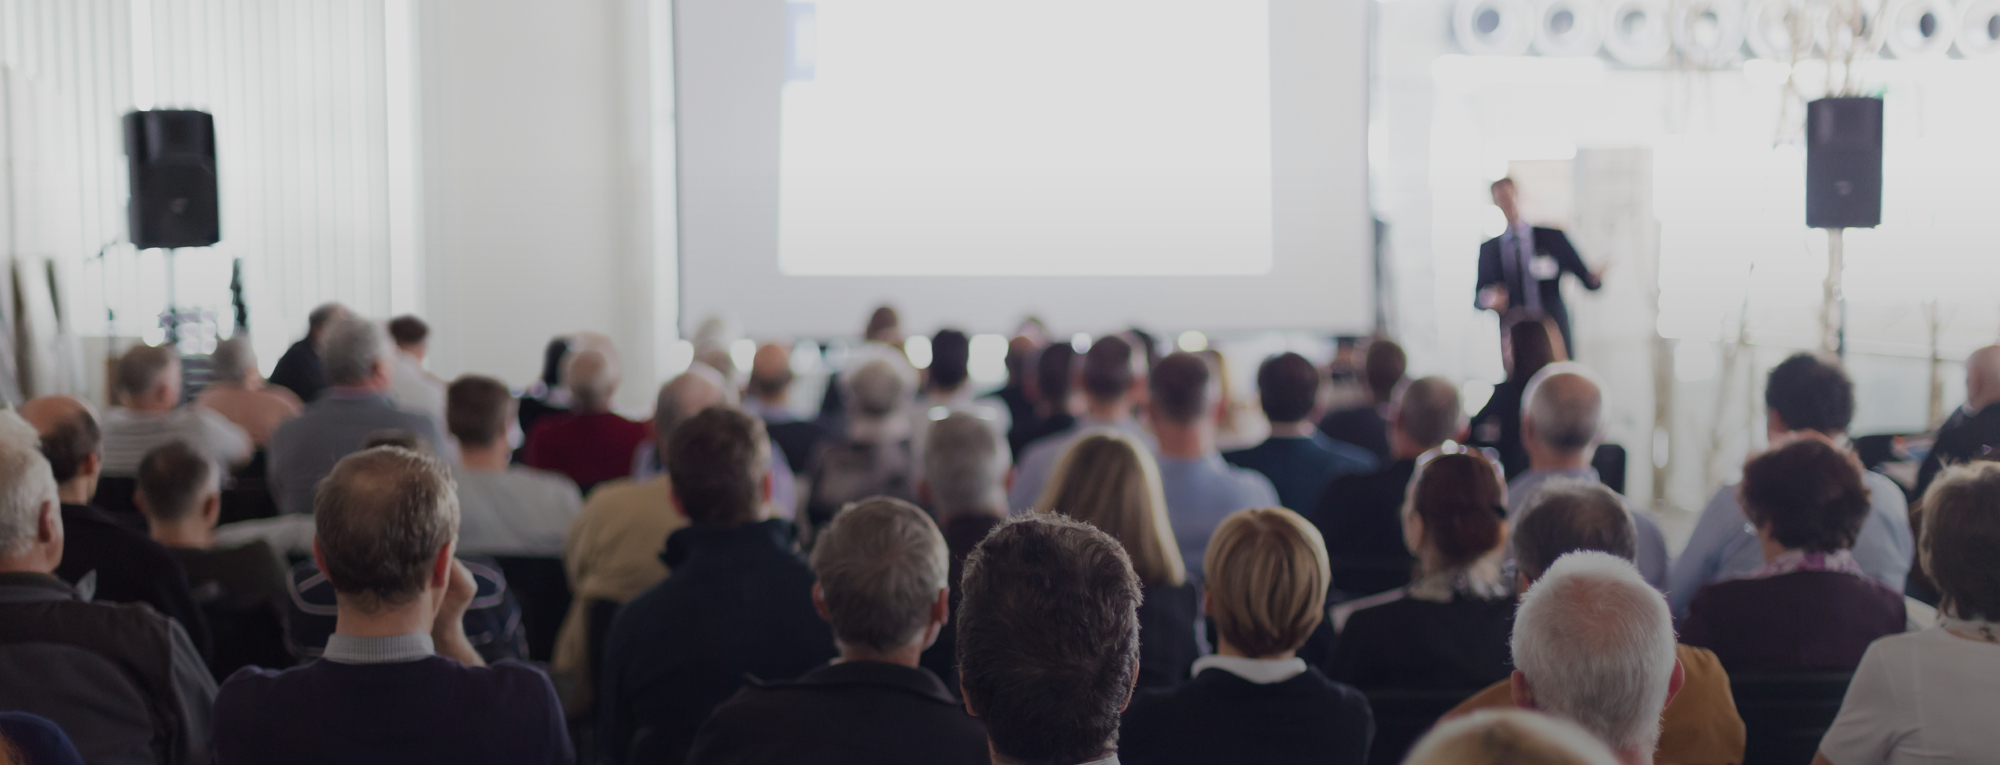 Corporate Training Success with IML's Progressive E-Management Programs